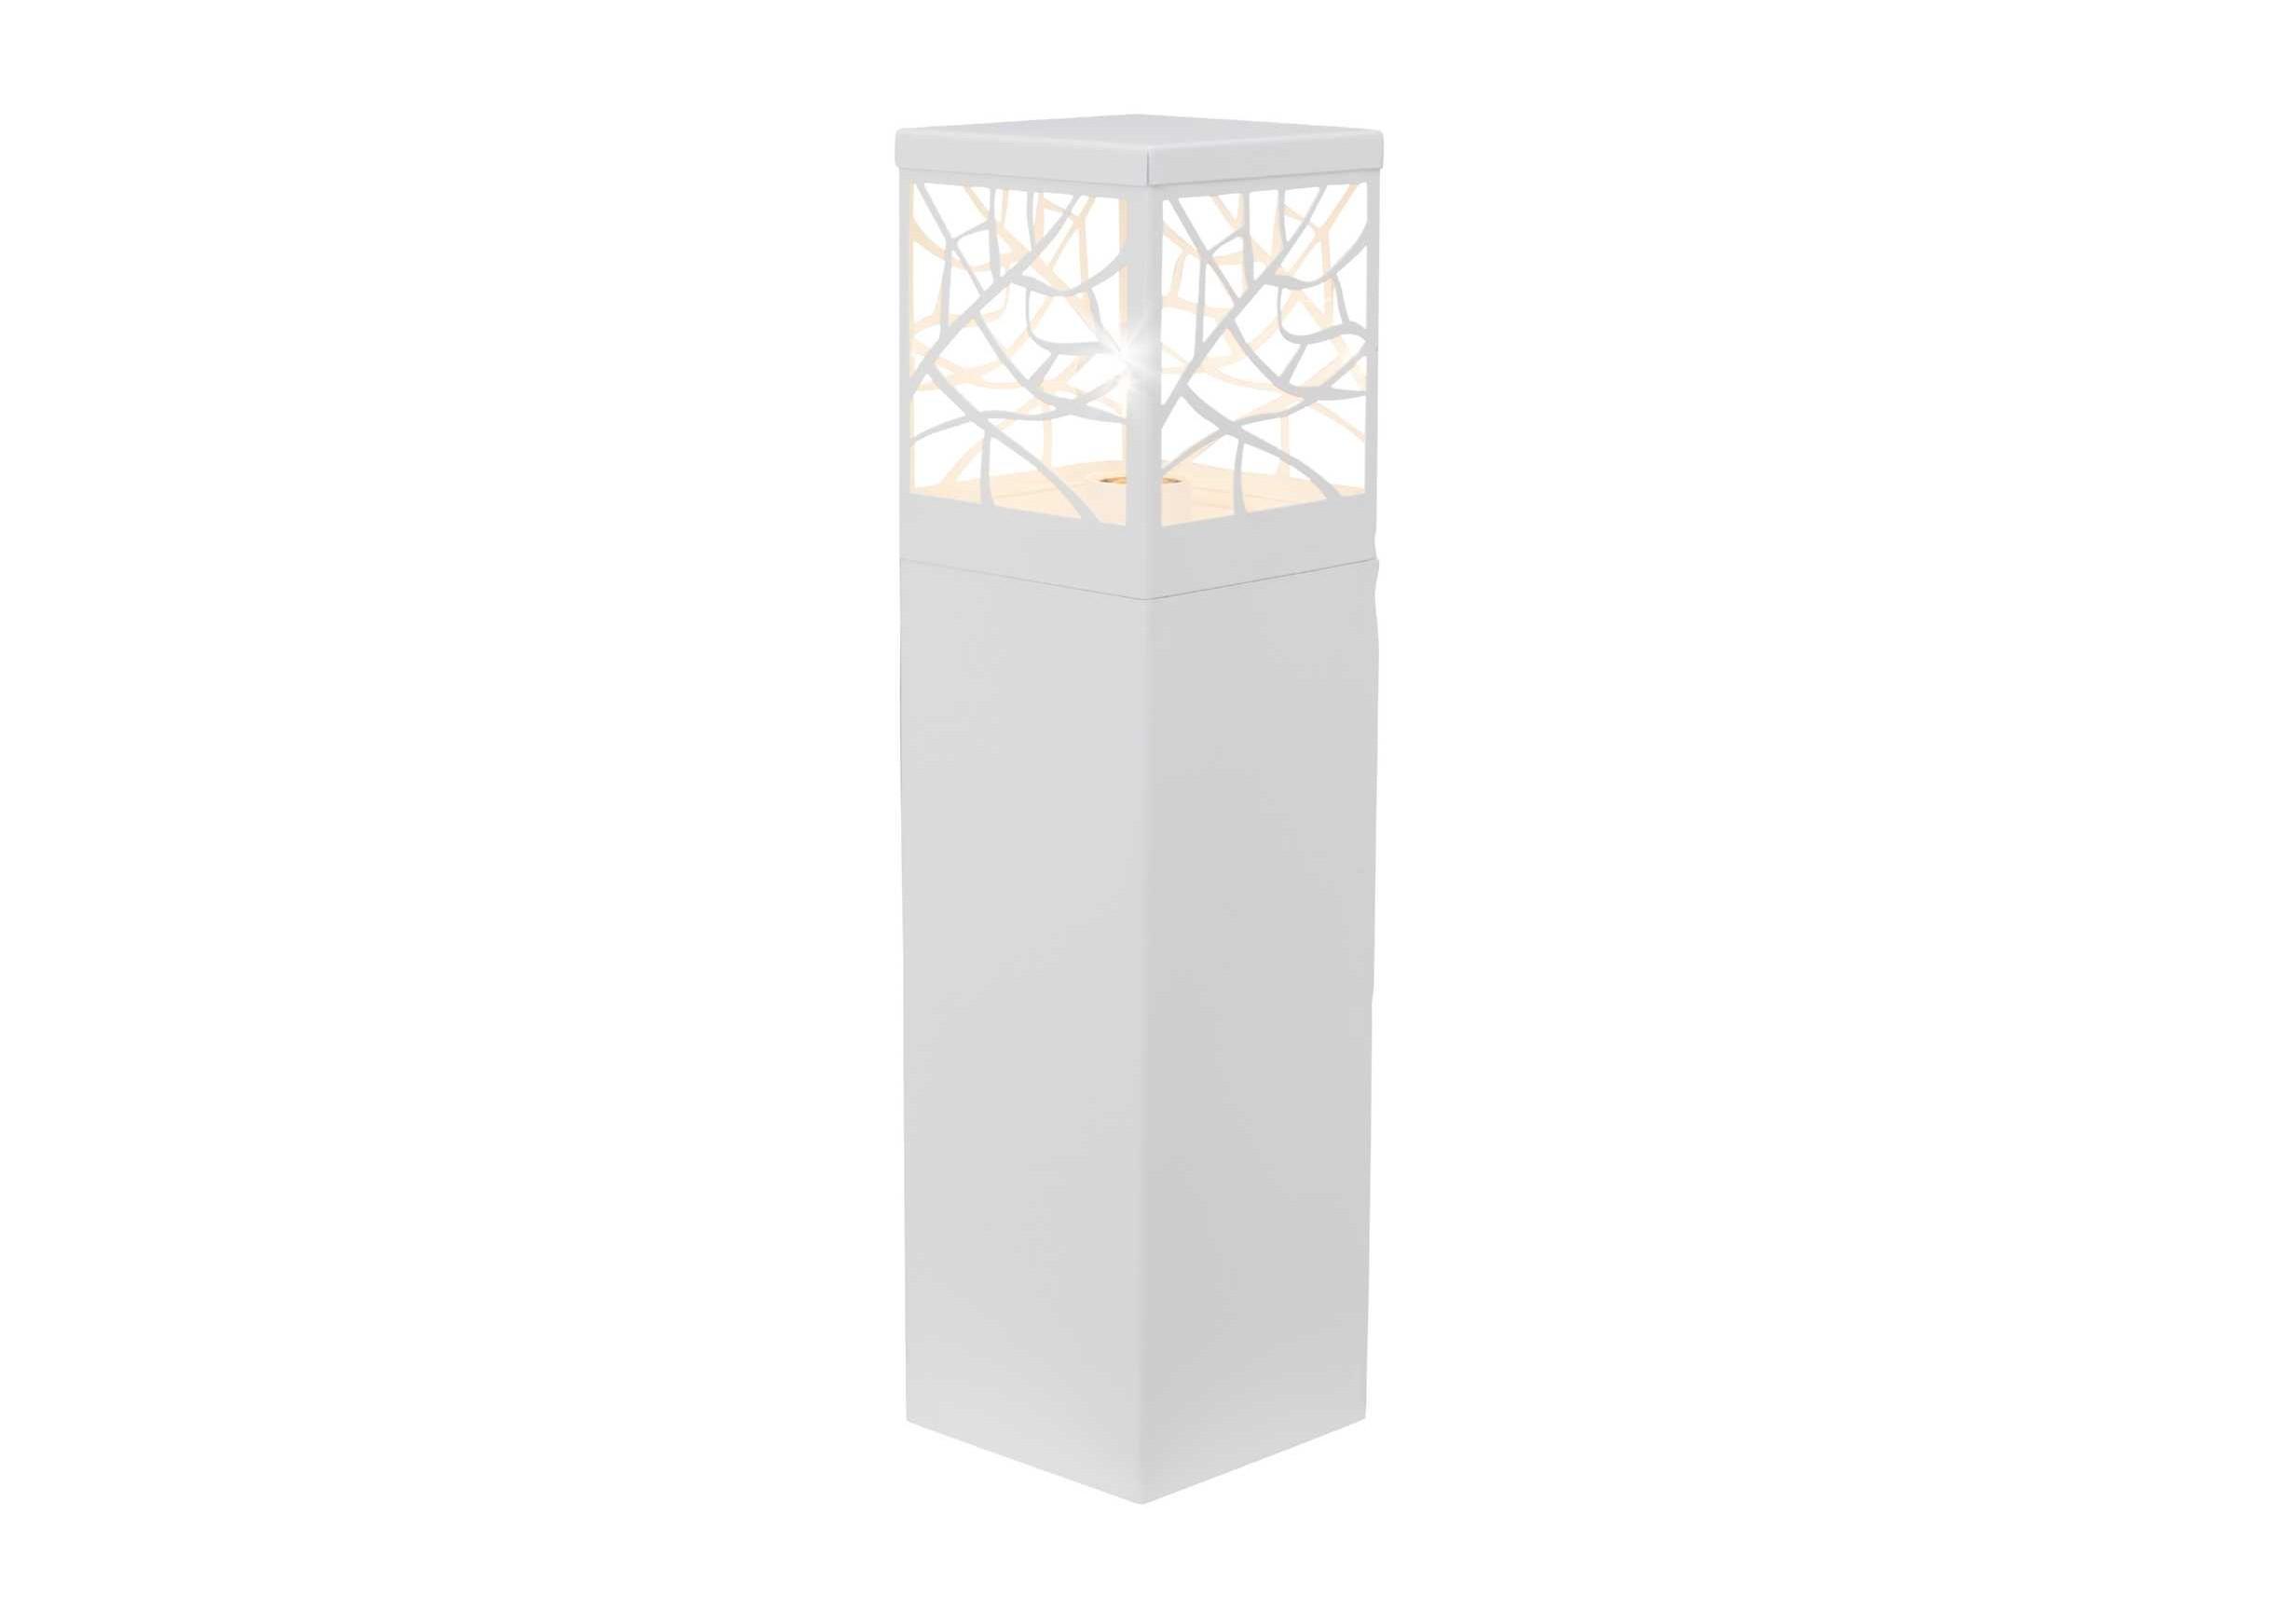 Светильник уличный WhitneyУличные наземные светильники<br>Вид цоколя: E27&amp;amp;nbsp;&amp;lt;div&amp;gt;Мощность ламп: 60W&amp;lt;br&amp;gt;&amp;lt;div&amp;gt;Количество ламп: 1&amp;amp;nbsp;&amp;lt;/div&amp;gt;&amp;lt;div&amp;gt;Наличие ламп: отсутствуют&amp;lt;/div&amp;gt;&amp;lt;/div&amp;gt;<br><br>Material: Металл<br>Ширина см: 15<br>Высота см: 59<br>Глубина см: 15